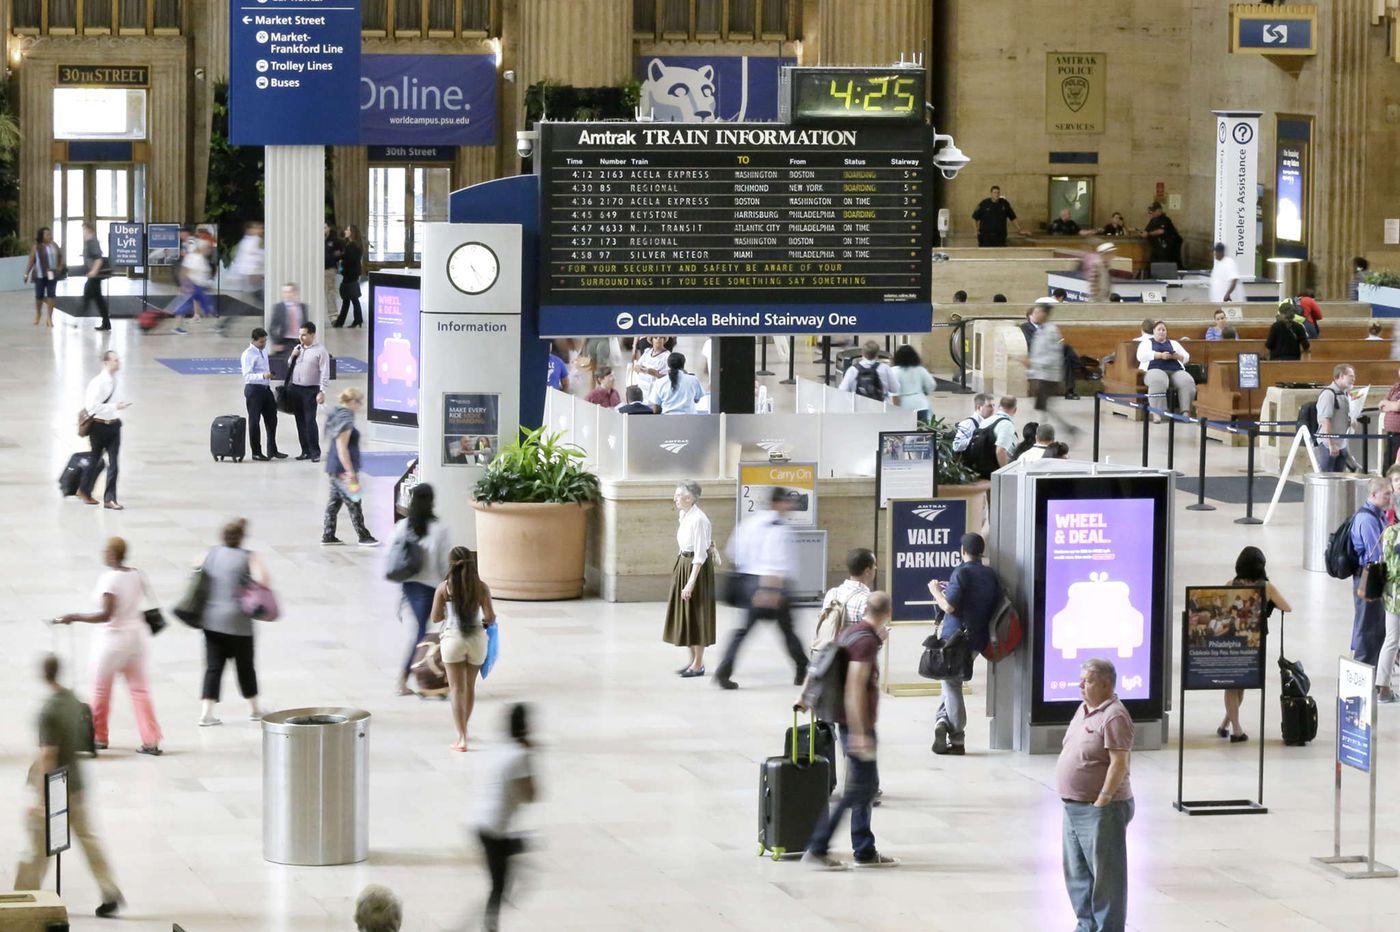 Amtrak, keep the mod flipboard sign. It's part of your heritage. | Inga Saffron